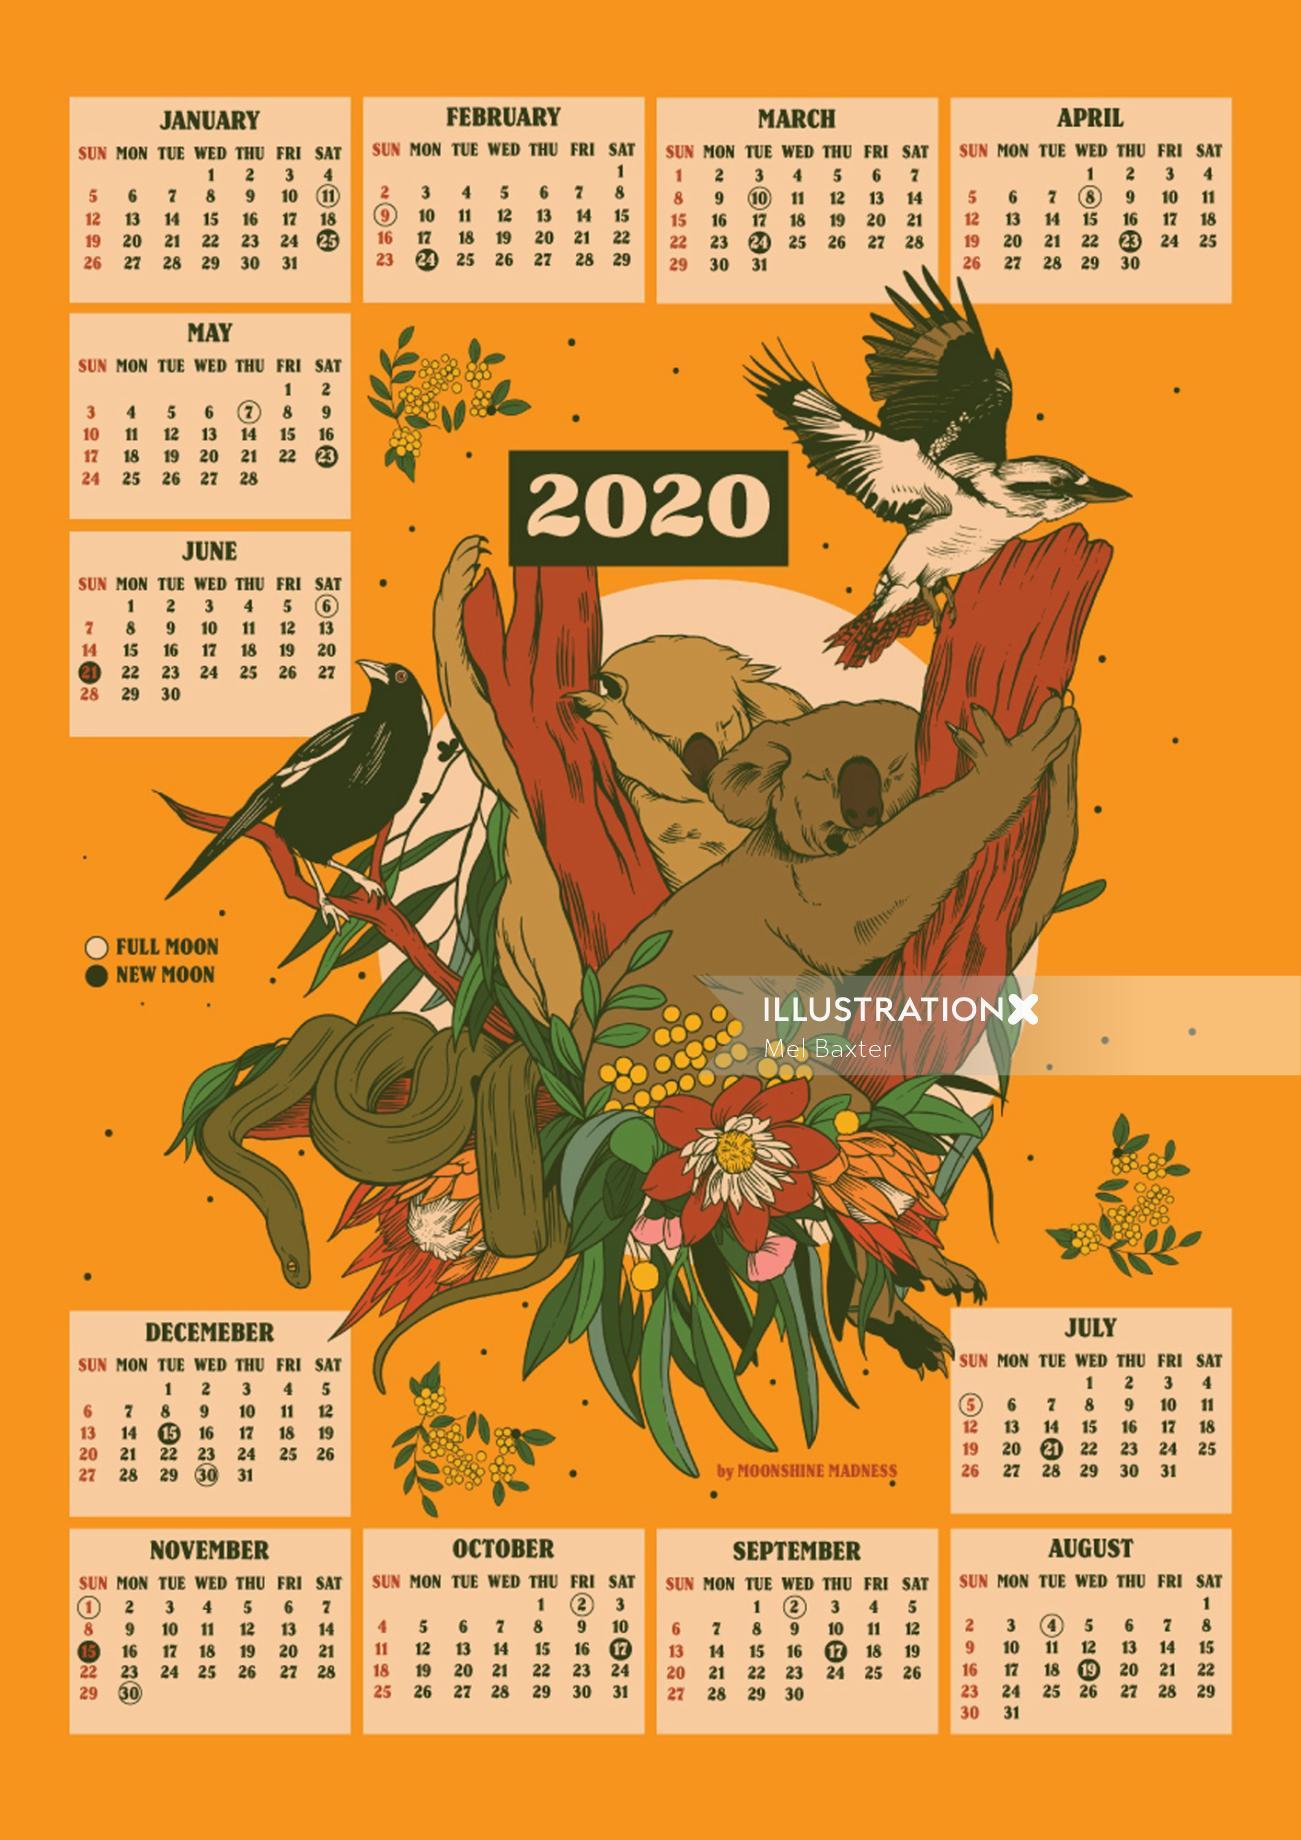 Retro art of birds design on calendar